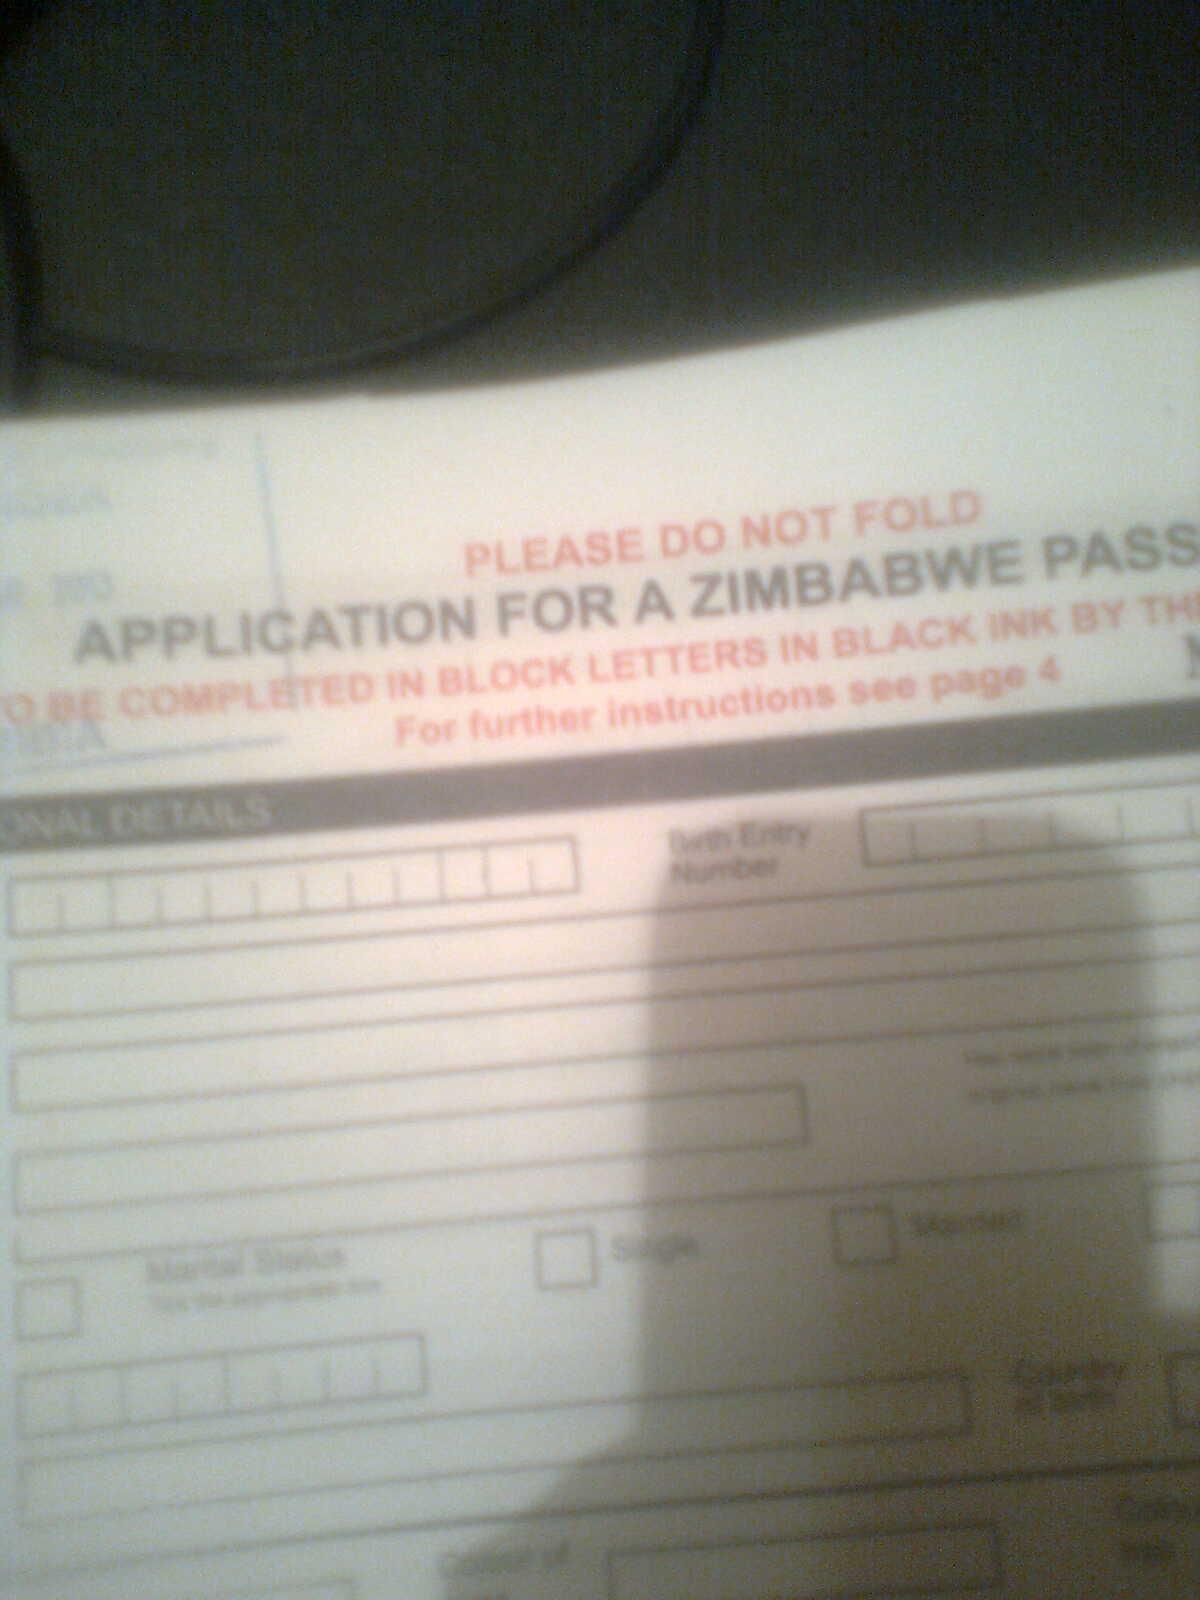 Zimbabwe Names How To Renew A Zimbabwe Passport At The Zim Embassy For Zimbabweans Living Abroad